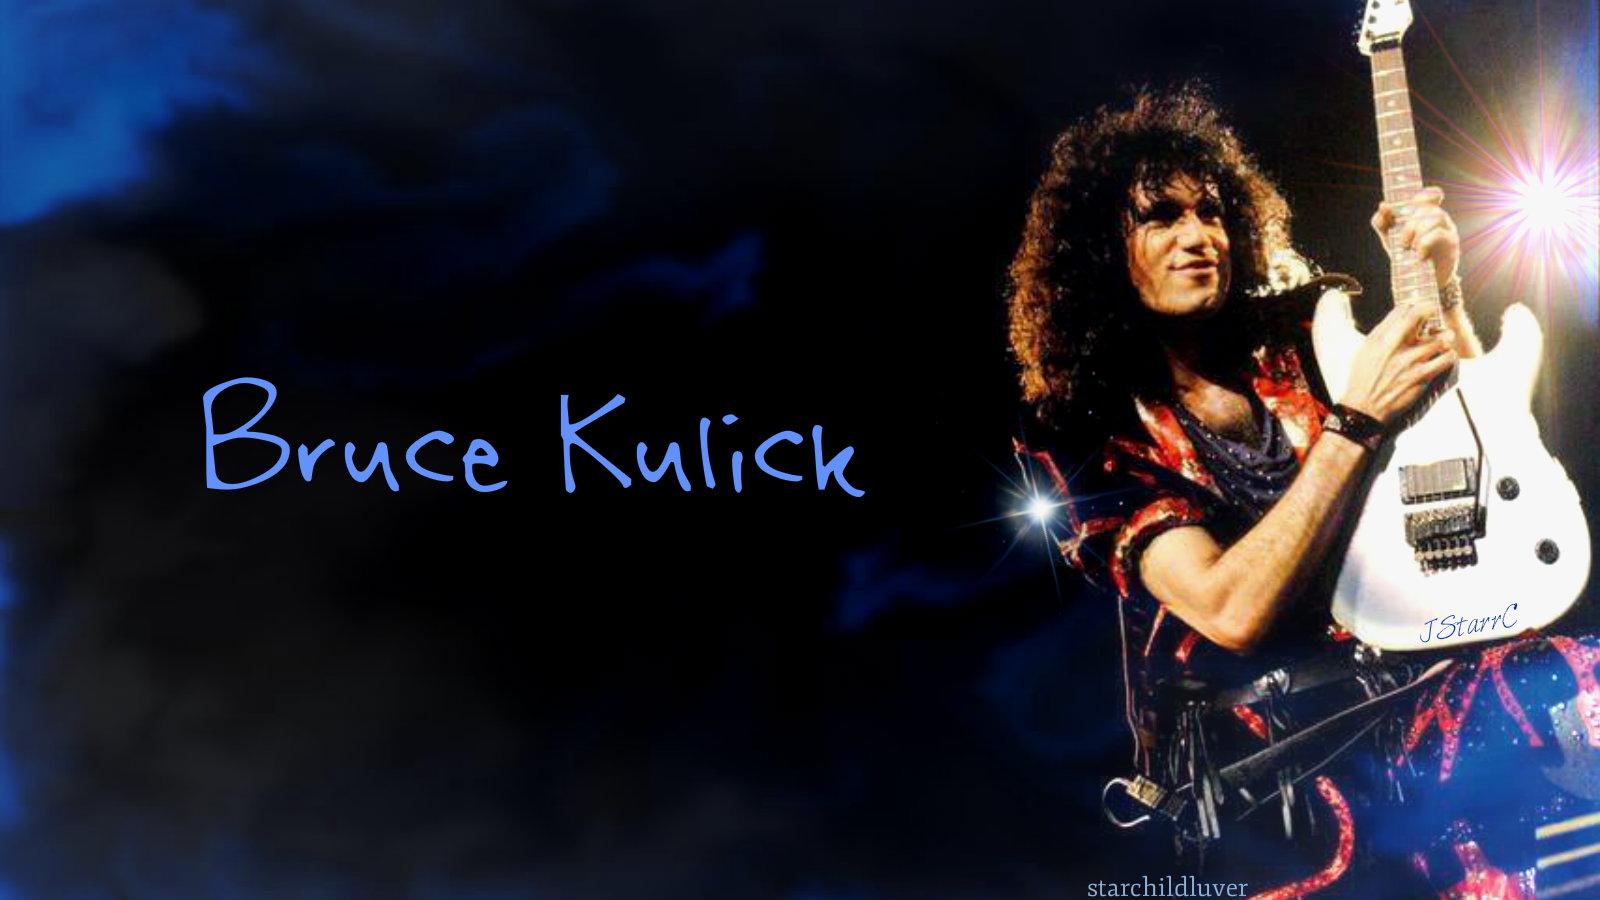 Bruce Kulick Net Worth